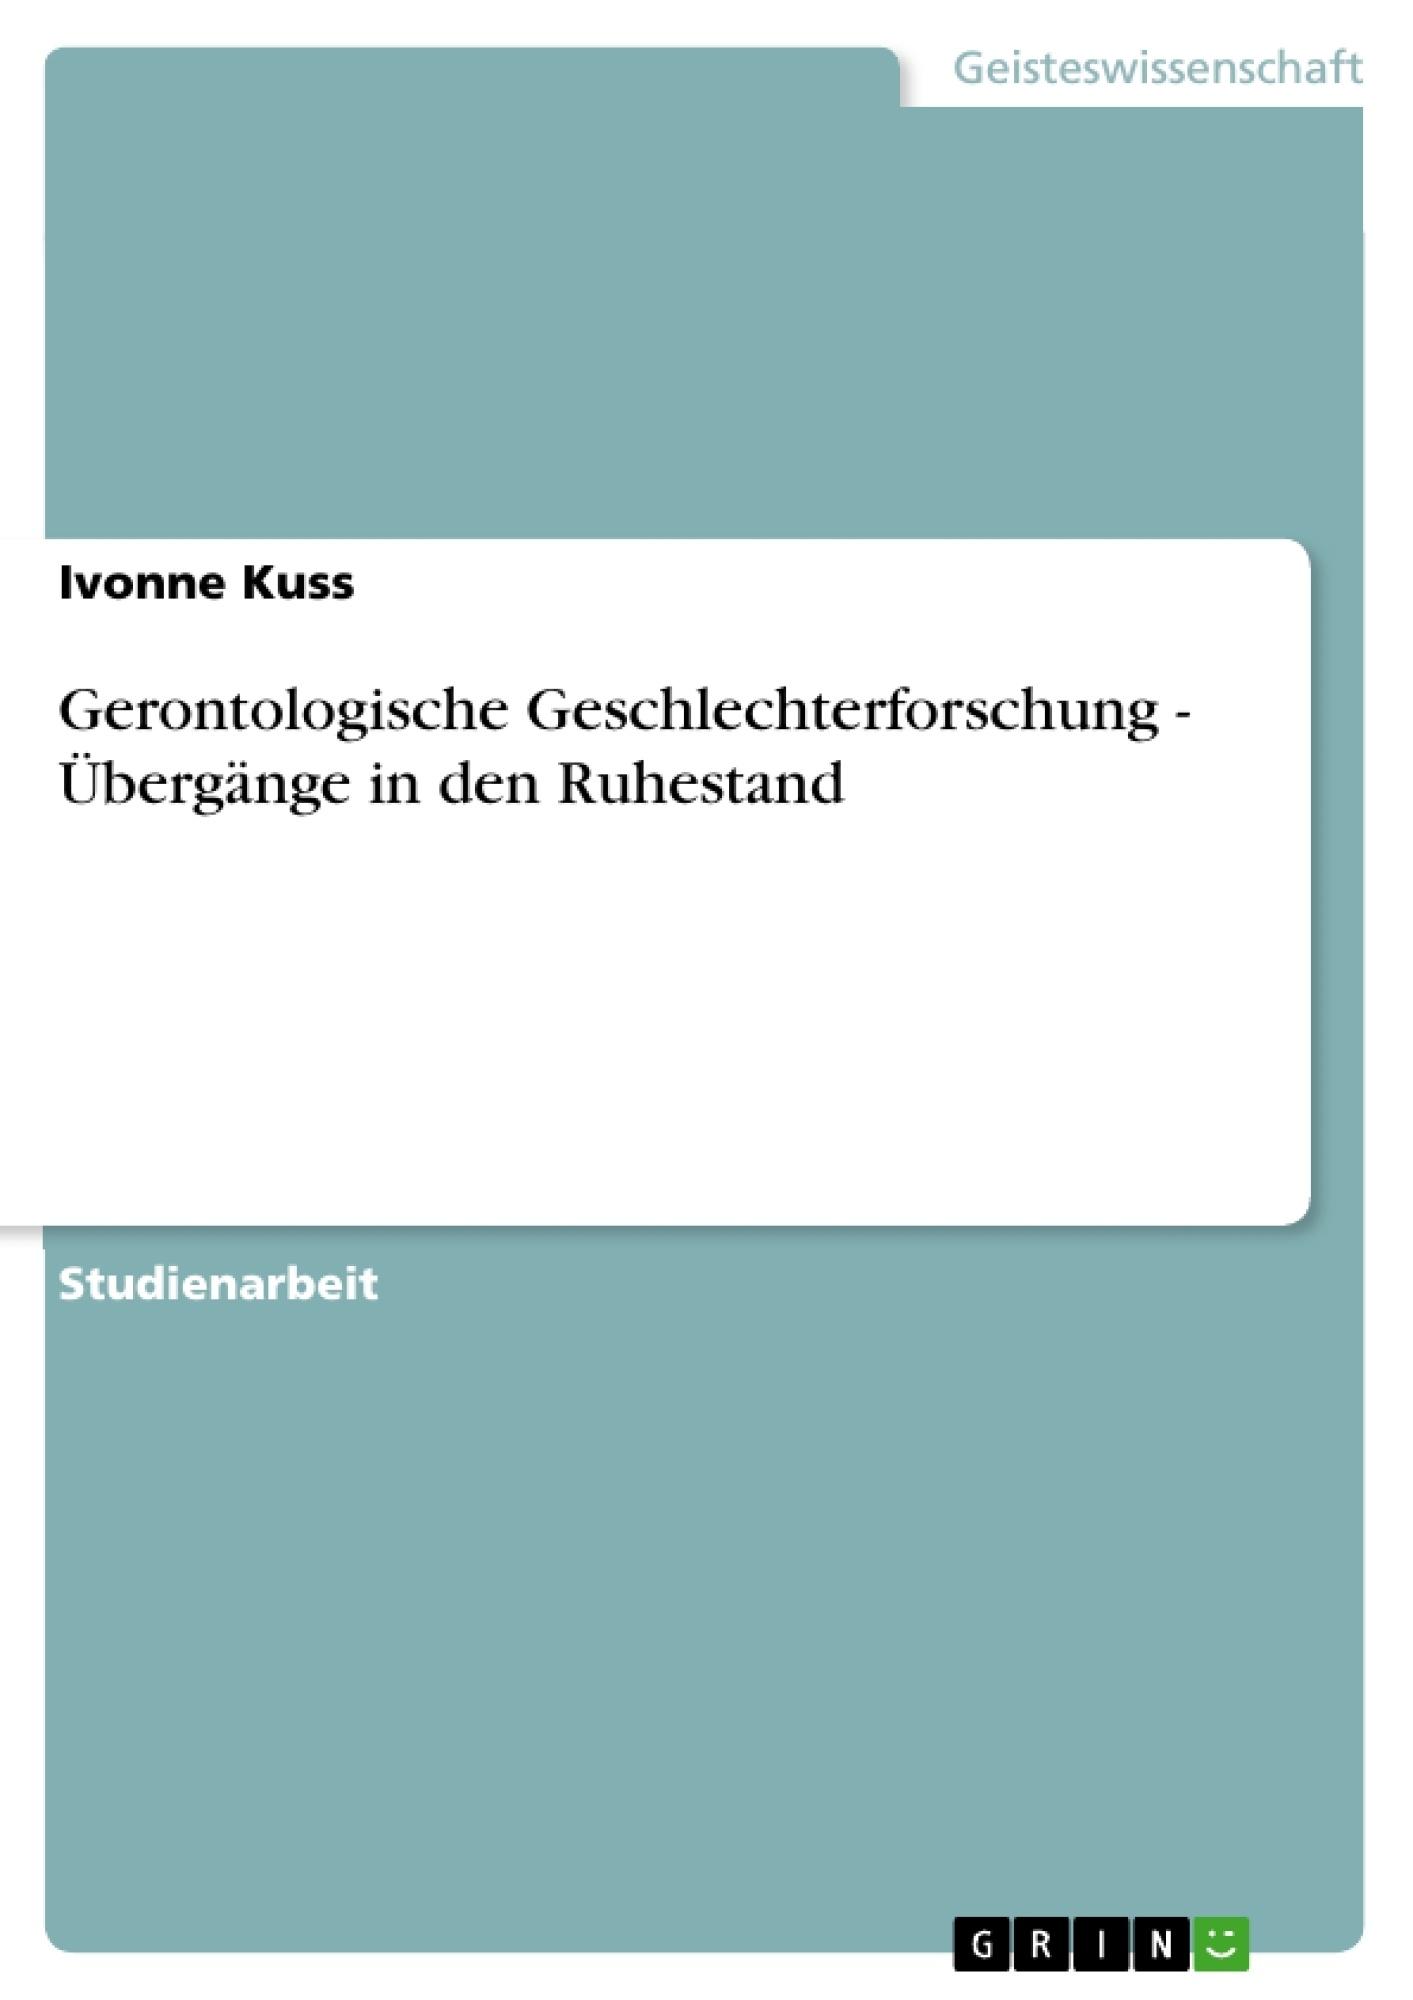 Titel: Gerontologische Geschlechterforschung - Übergänge in den Ruhestand